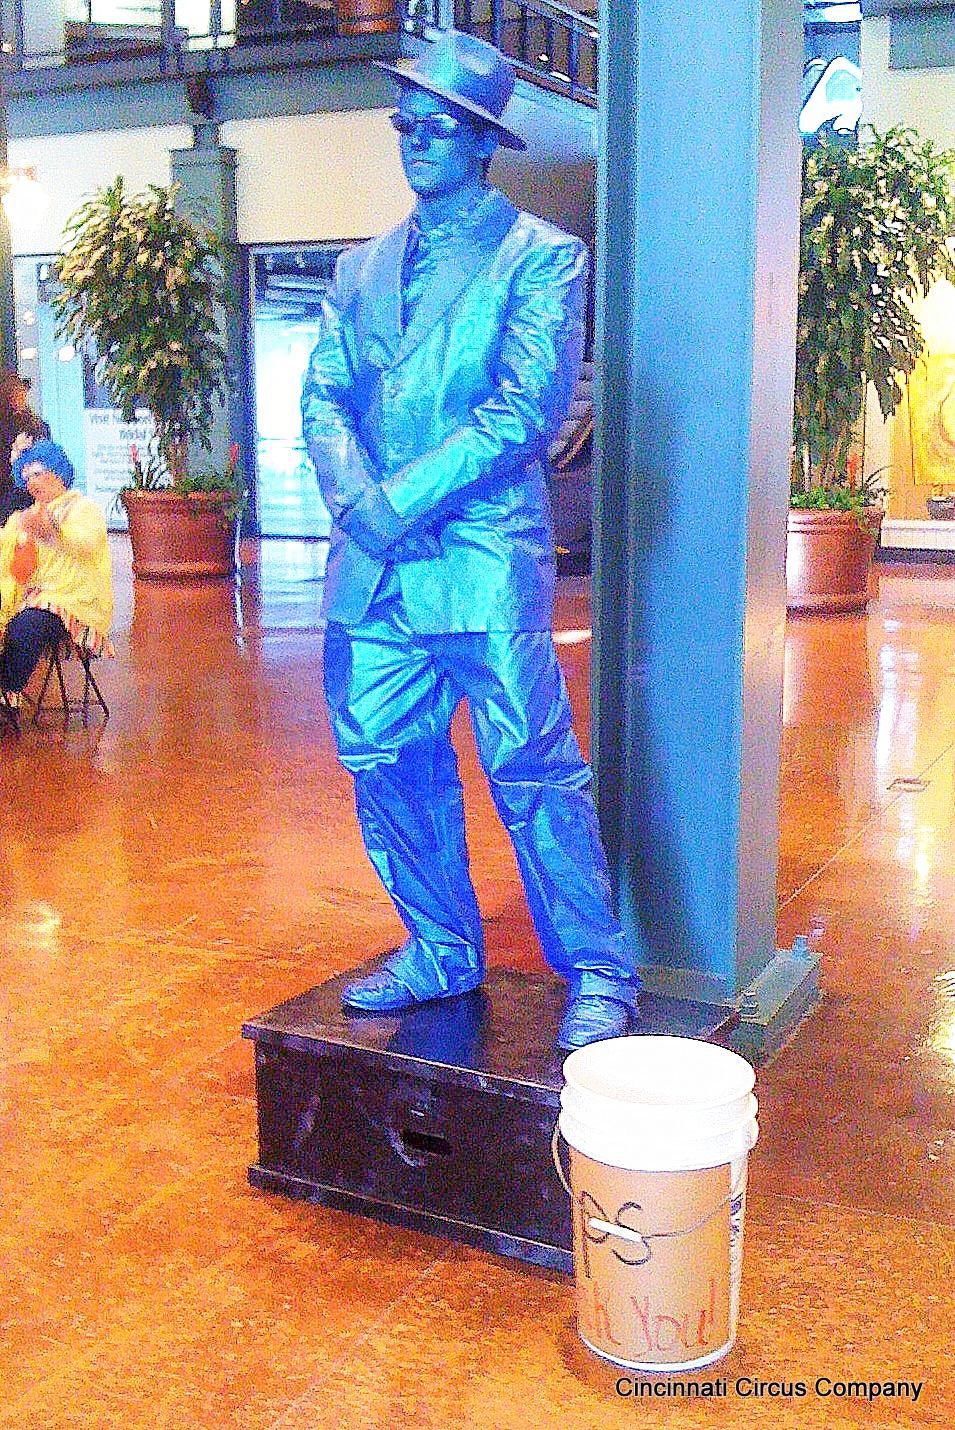 Statue_Blue_Man_02